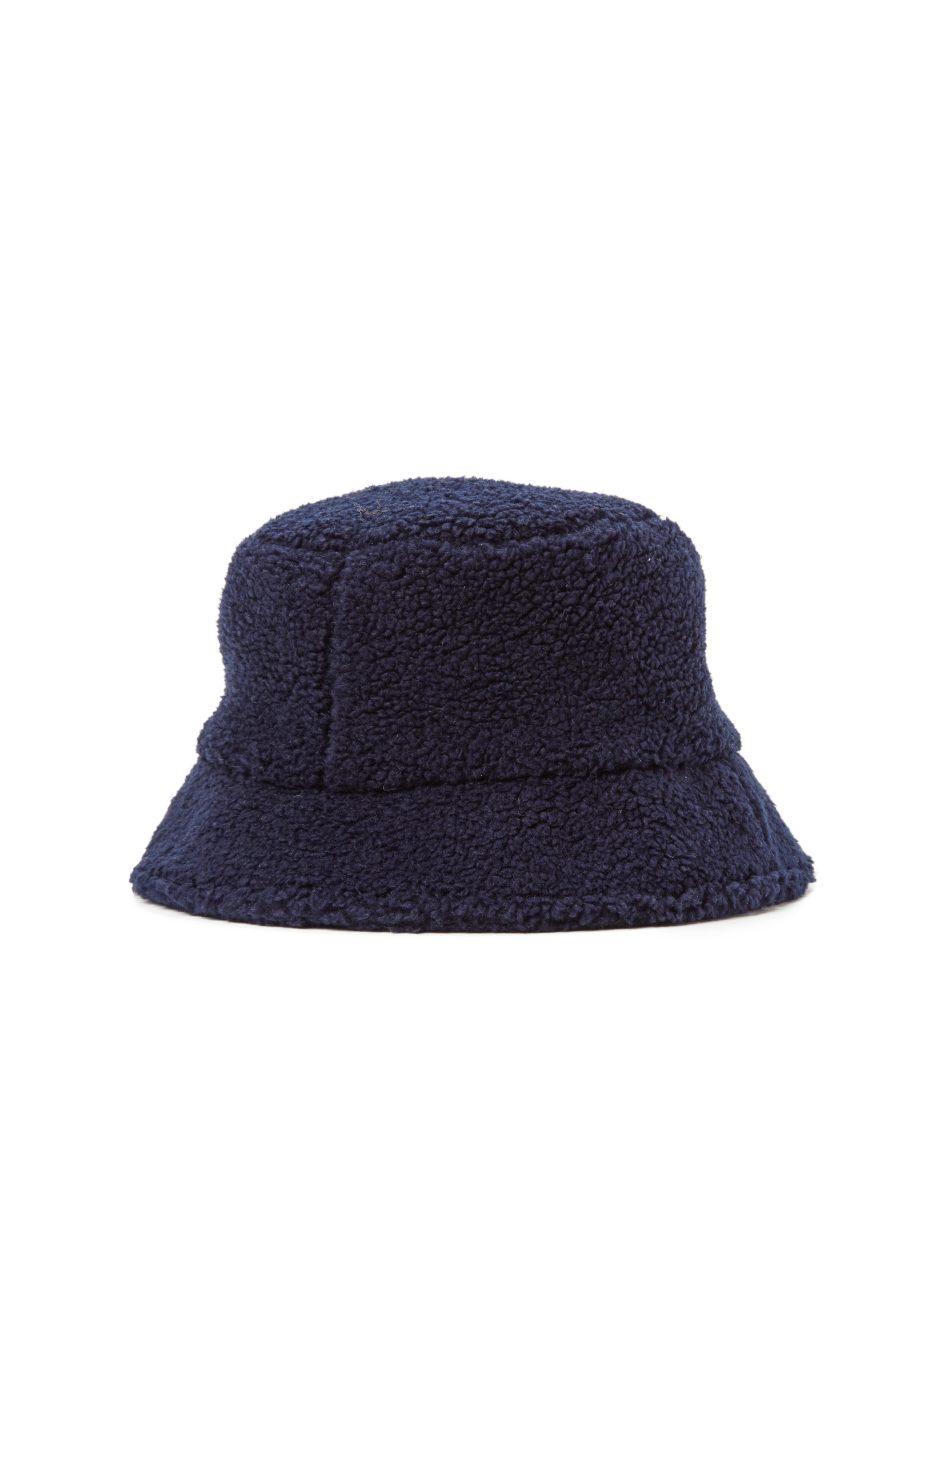 Fleece Bucket Hat - You Must Create (YMC) 2e8717509b0